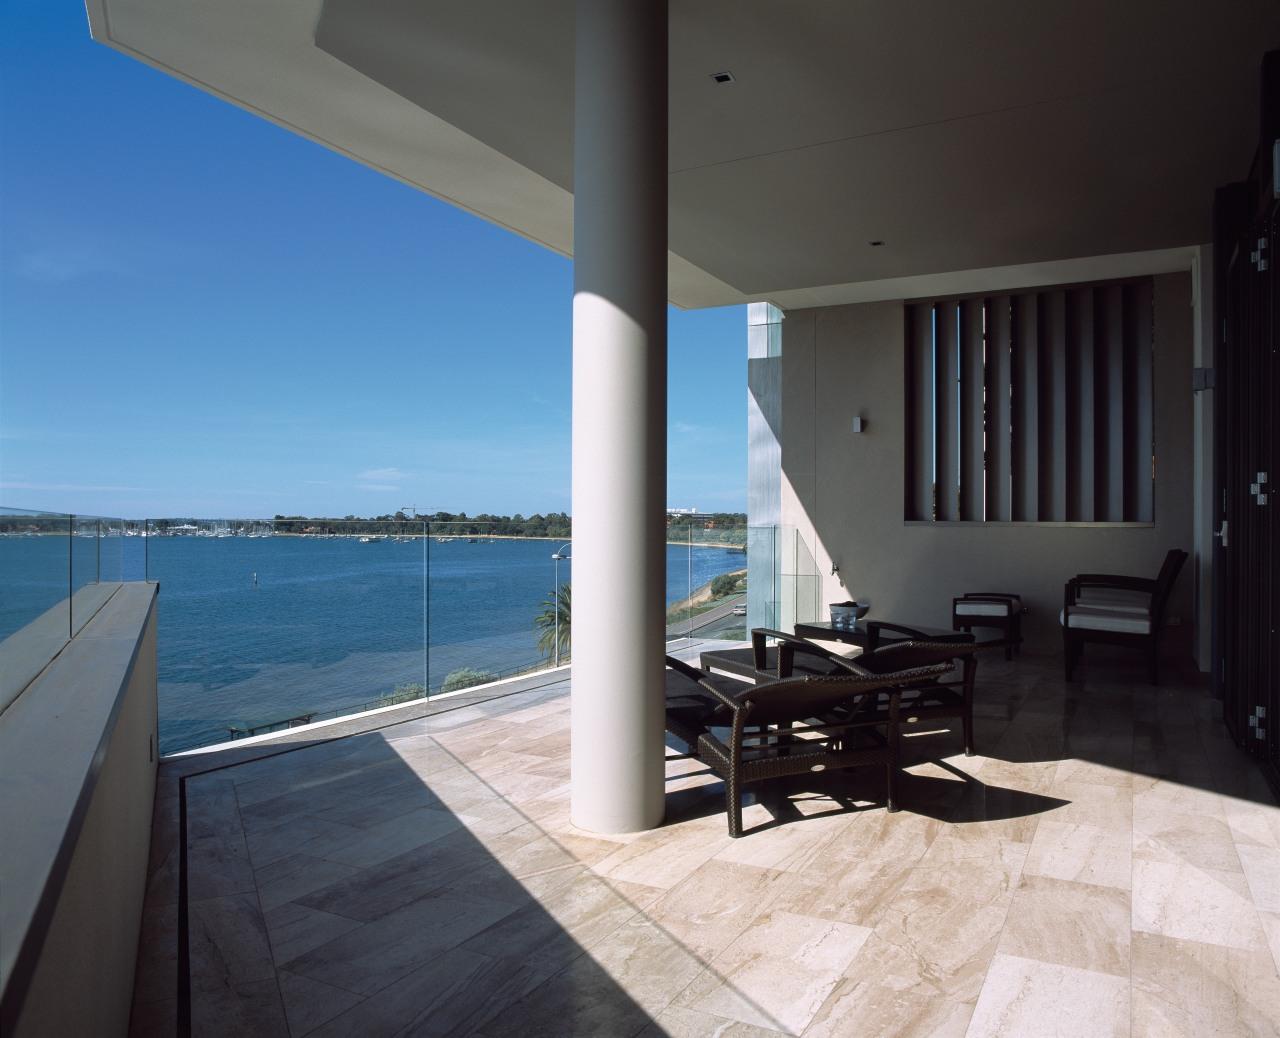 Cygen Crawley Edge Apartments have 50m² balconies that apartment, architecture, condominium, daylighting, estate, floor, house, interior design, penthouse apartment, property, real estate, sea, sky, window, black